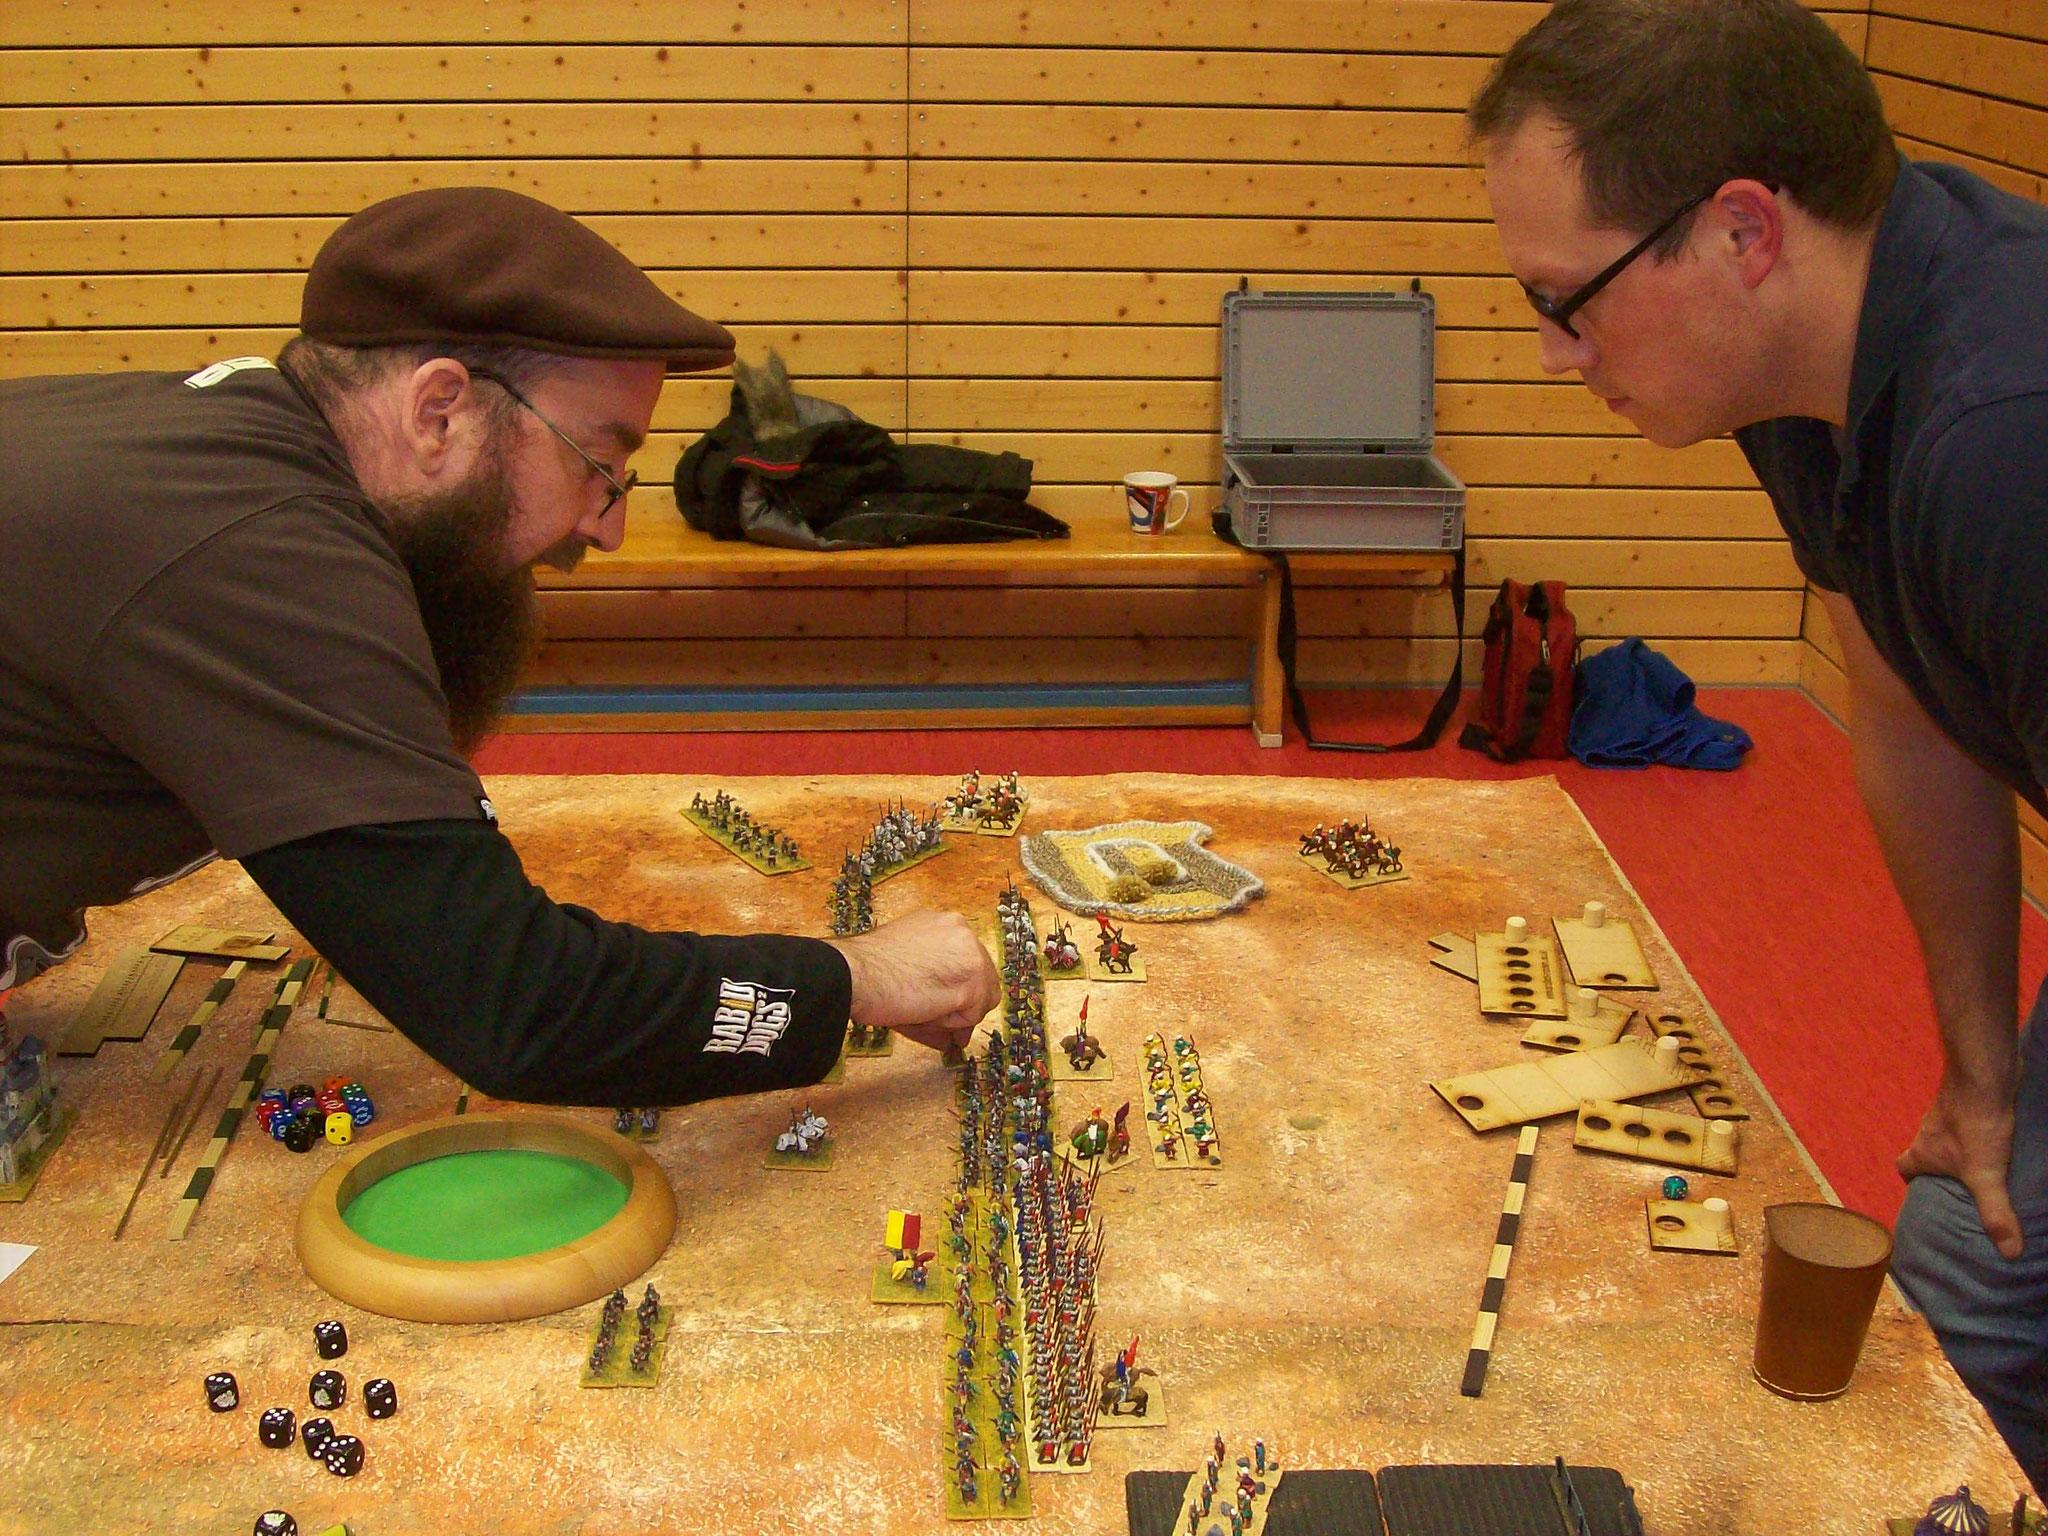 Koblenz-internes Duell: Andreas und Christian